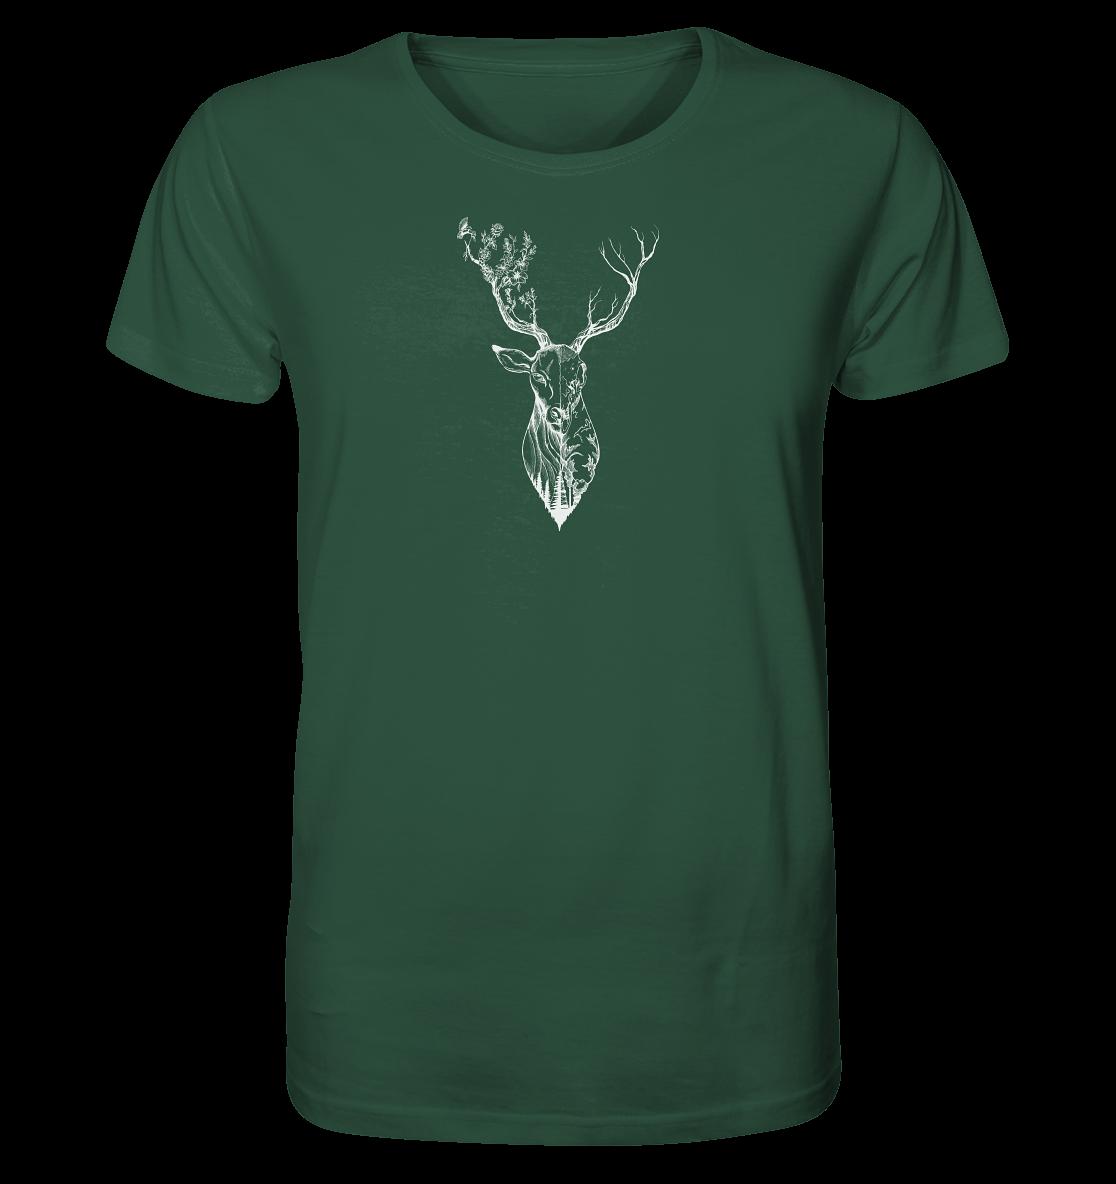 front-organic-shirt-2f5240-1116x-6.png